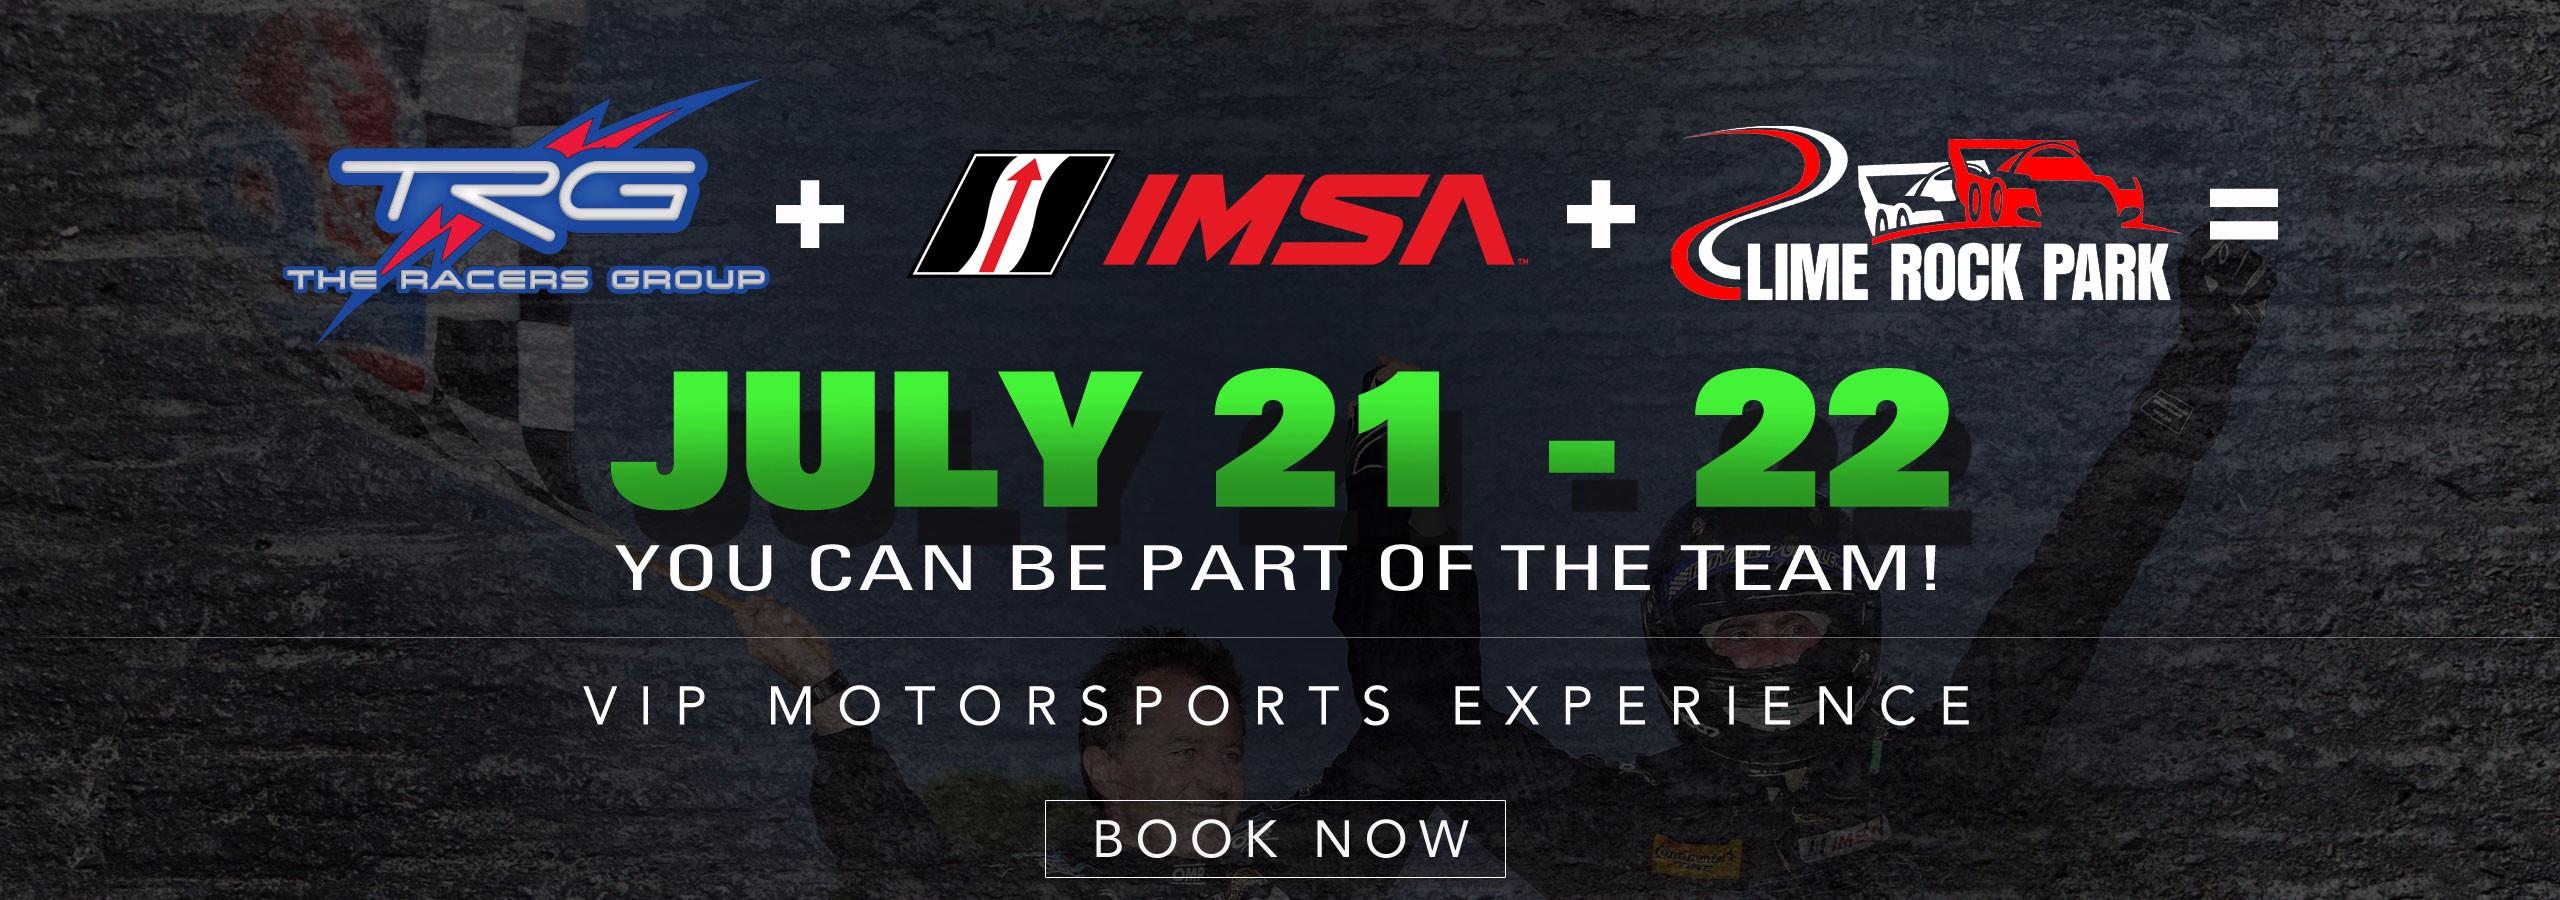 Limerock Park Motorsports Experience, Northeast Grand Prix